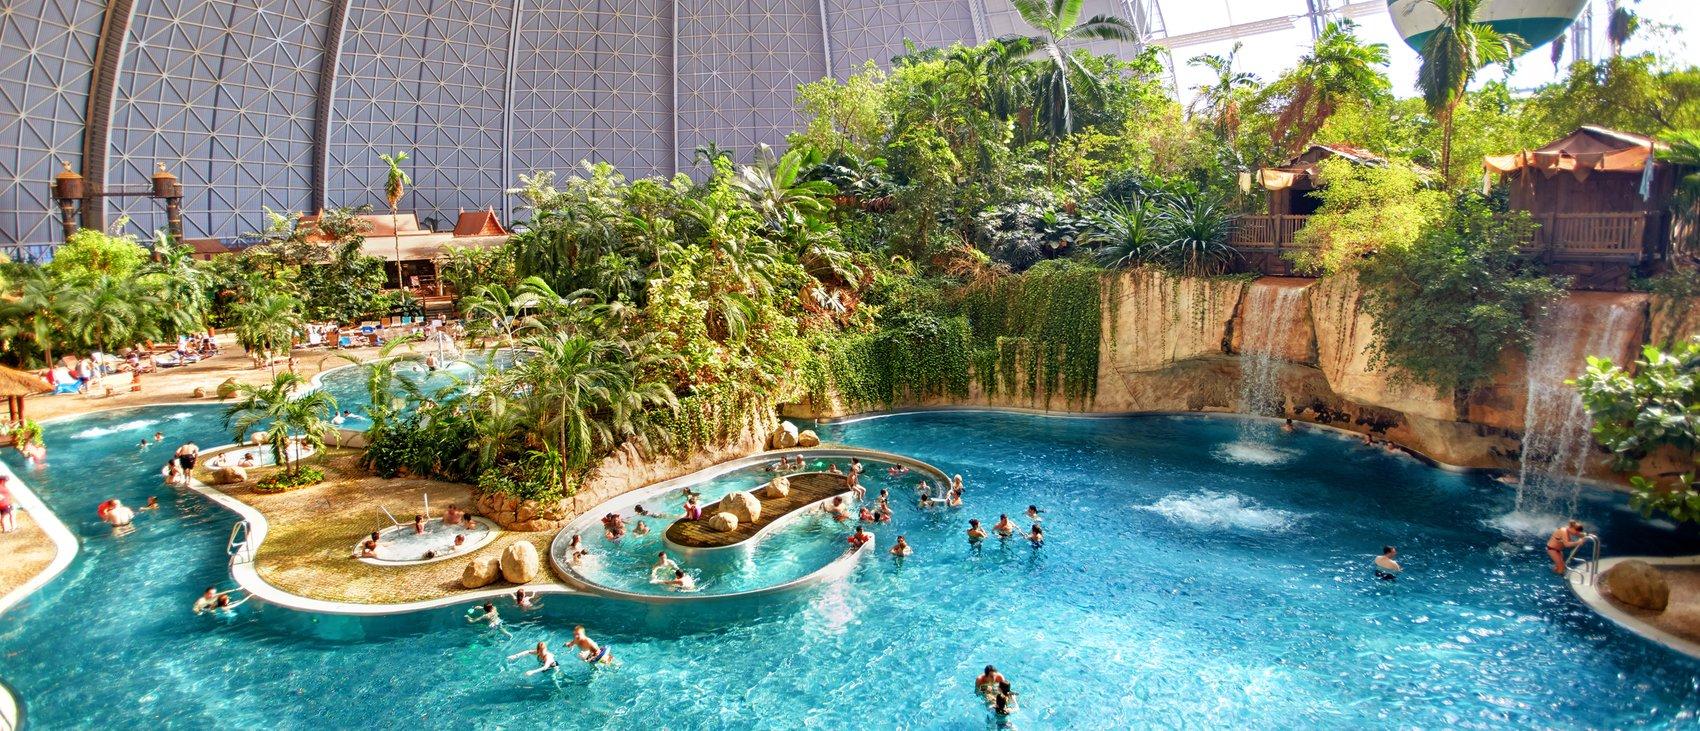 Supertrips - Resort Tropical Islands